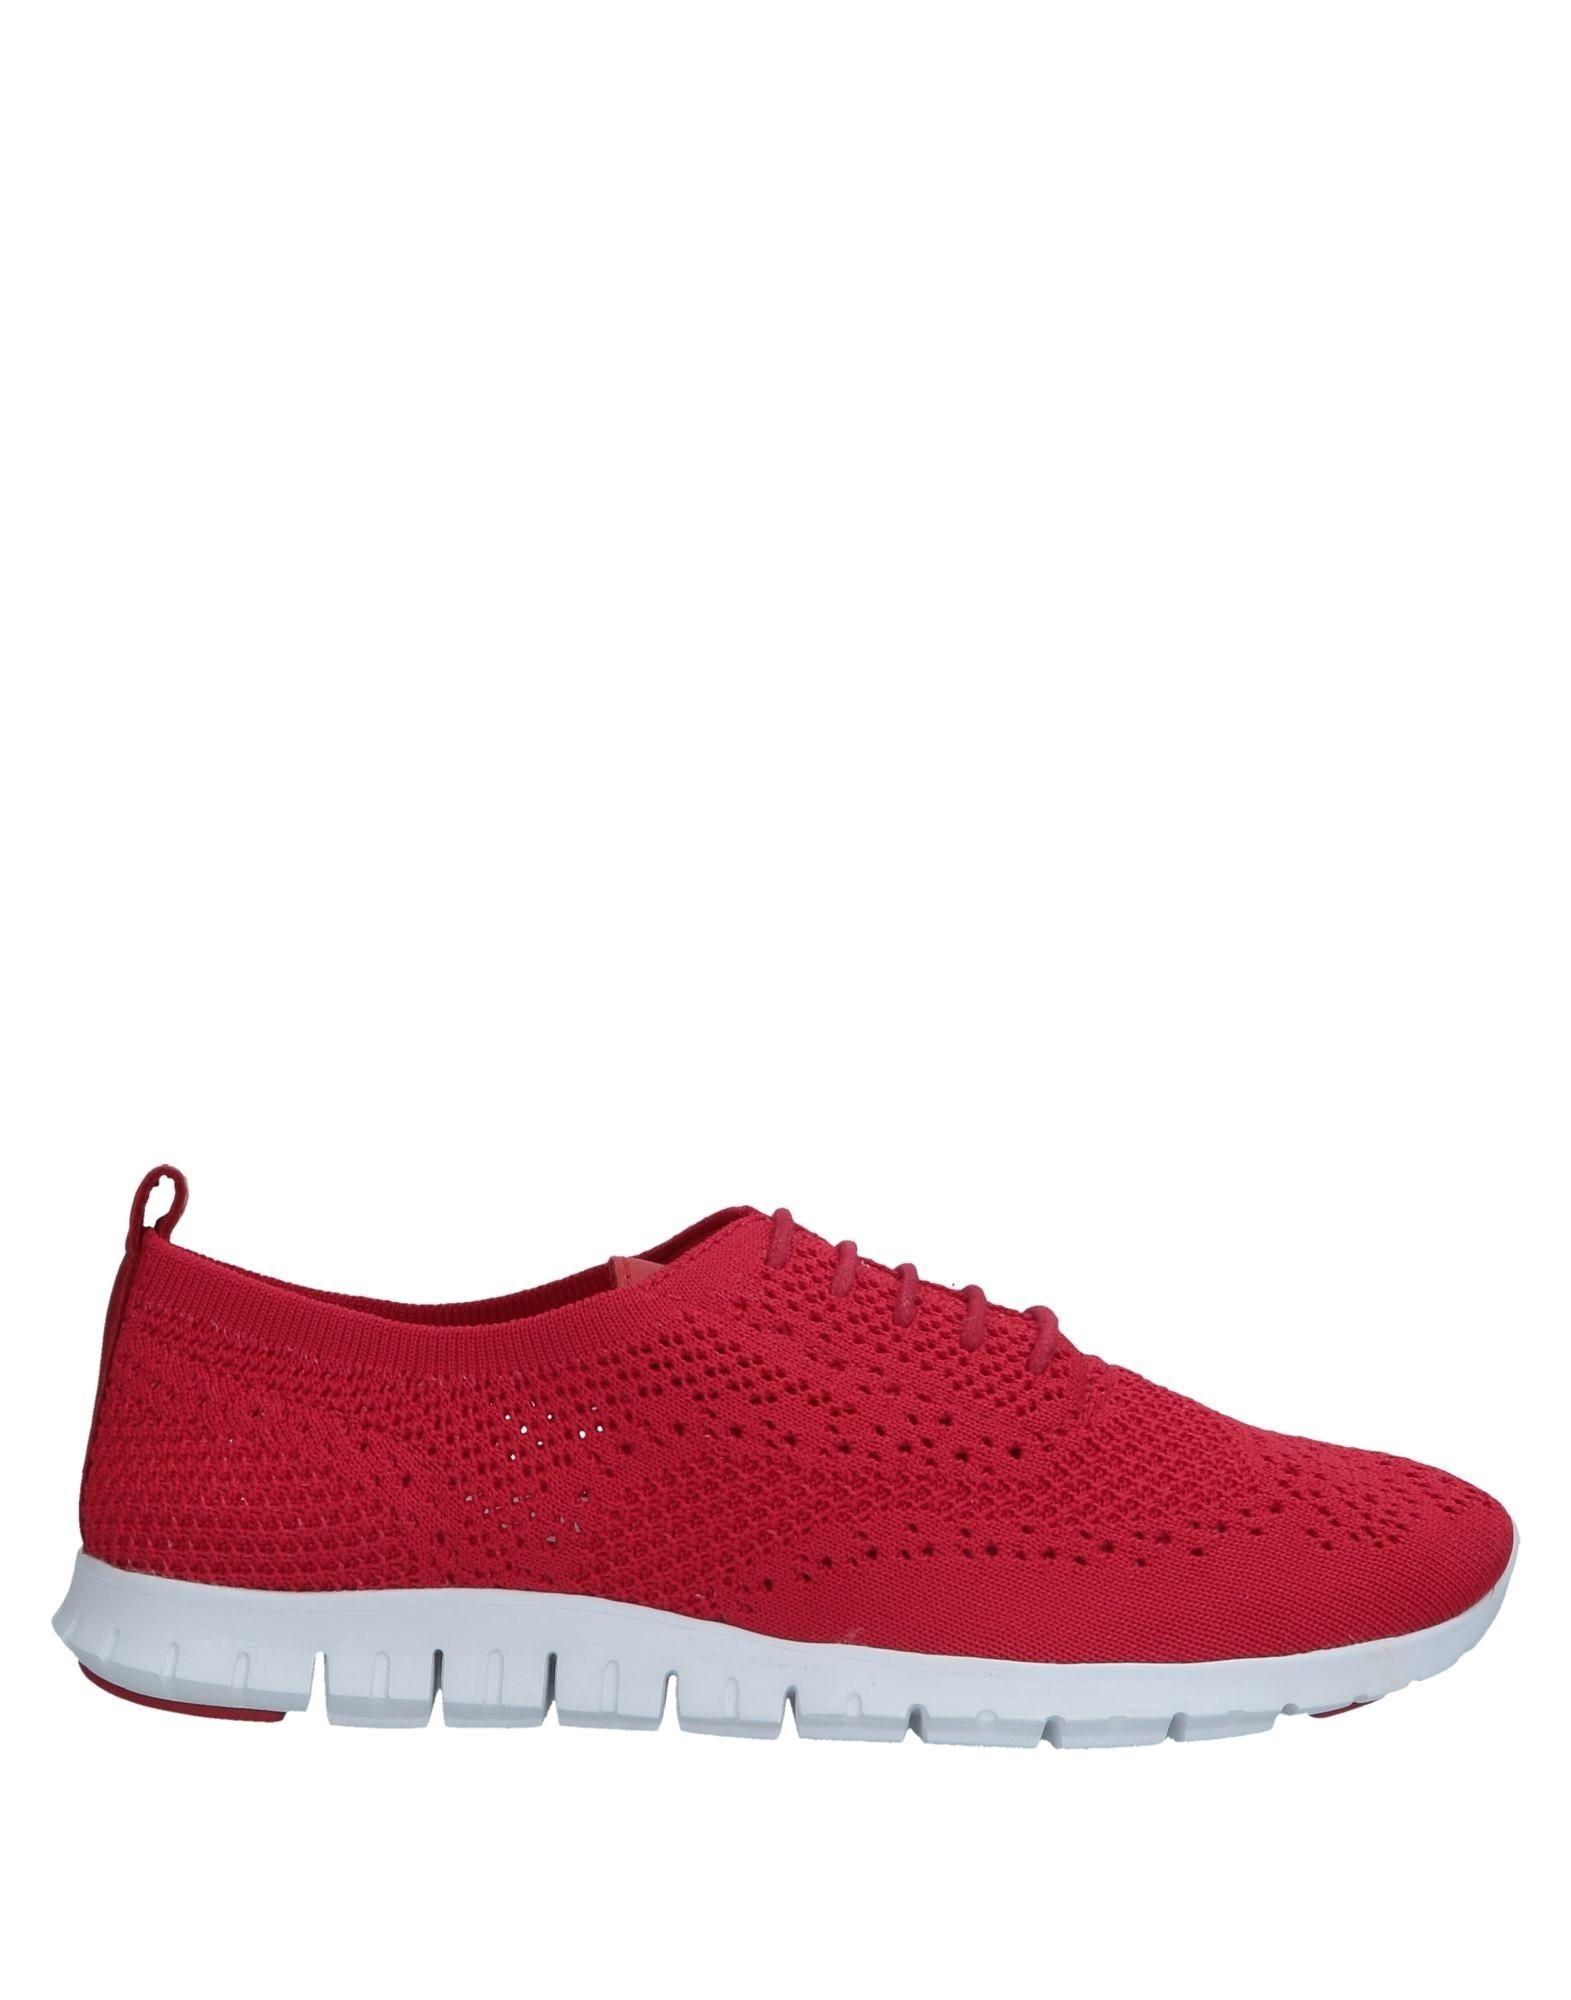 Cole Haan Sneakers - Women Cole Haan Sneakers - online on  Australia - Sneakers 11583700RE 9b5ea5